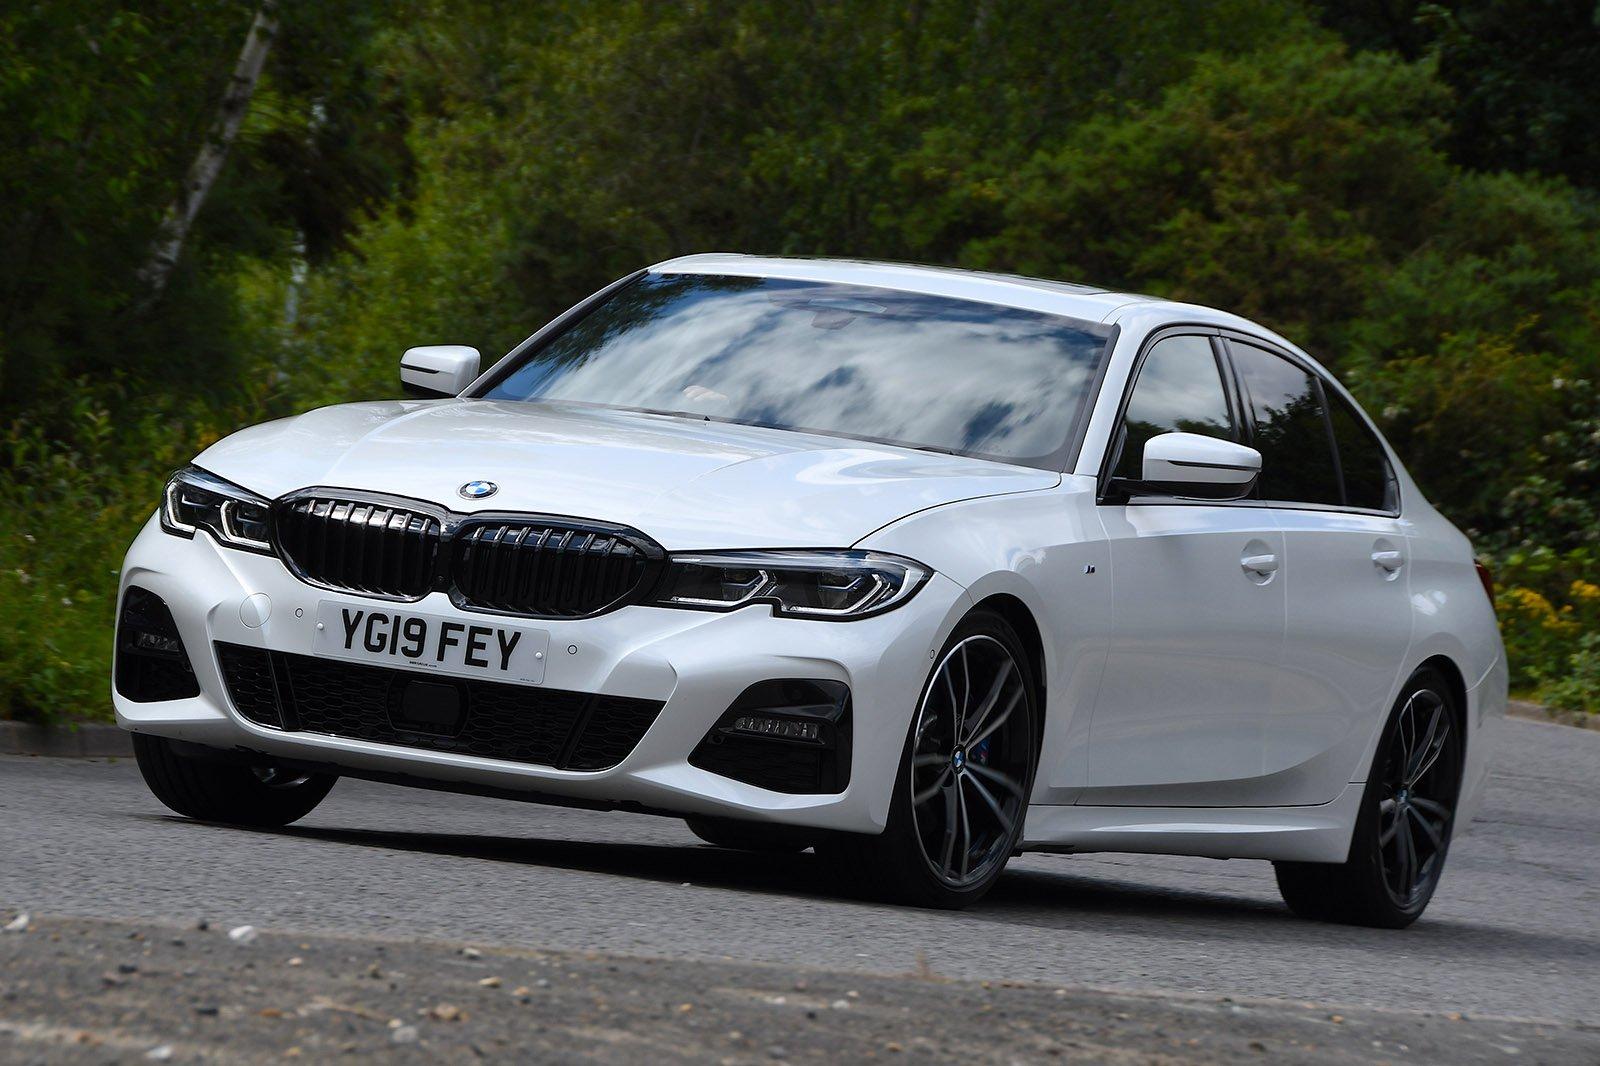 2019 BMW 330d cornering